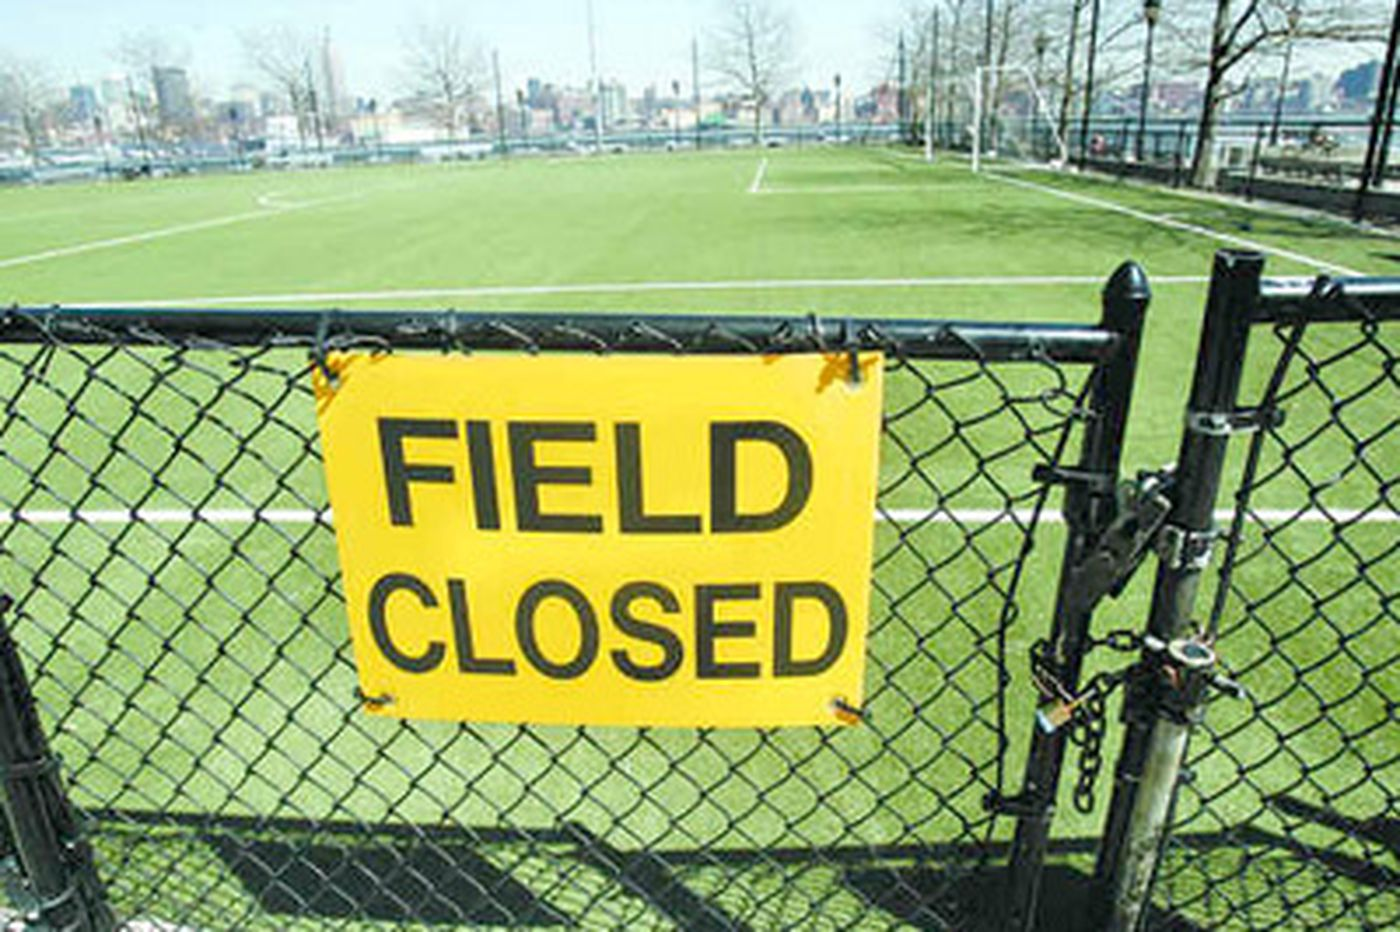 Schools await a U.S. report on artifical turf